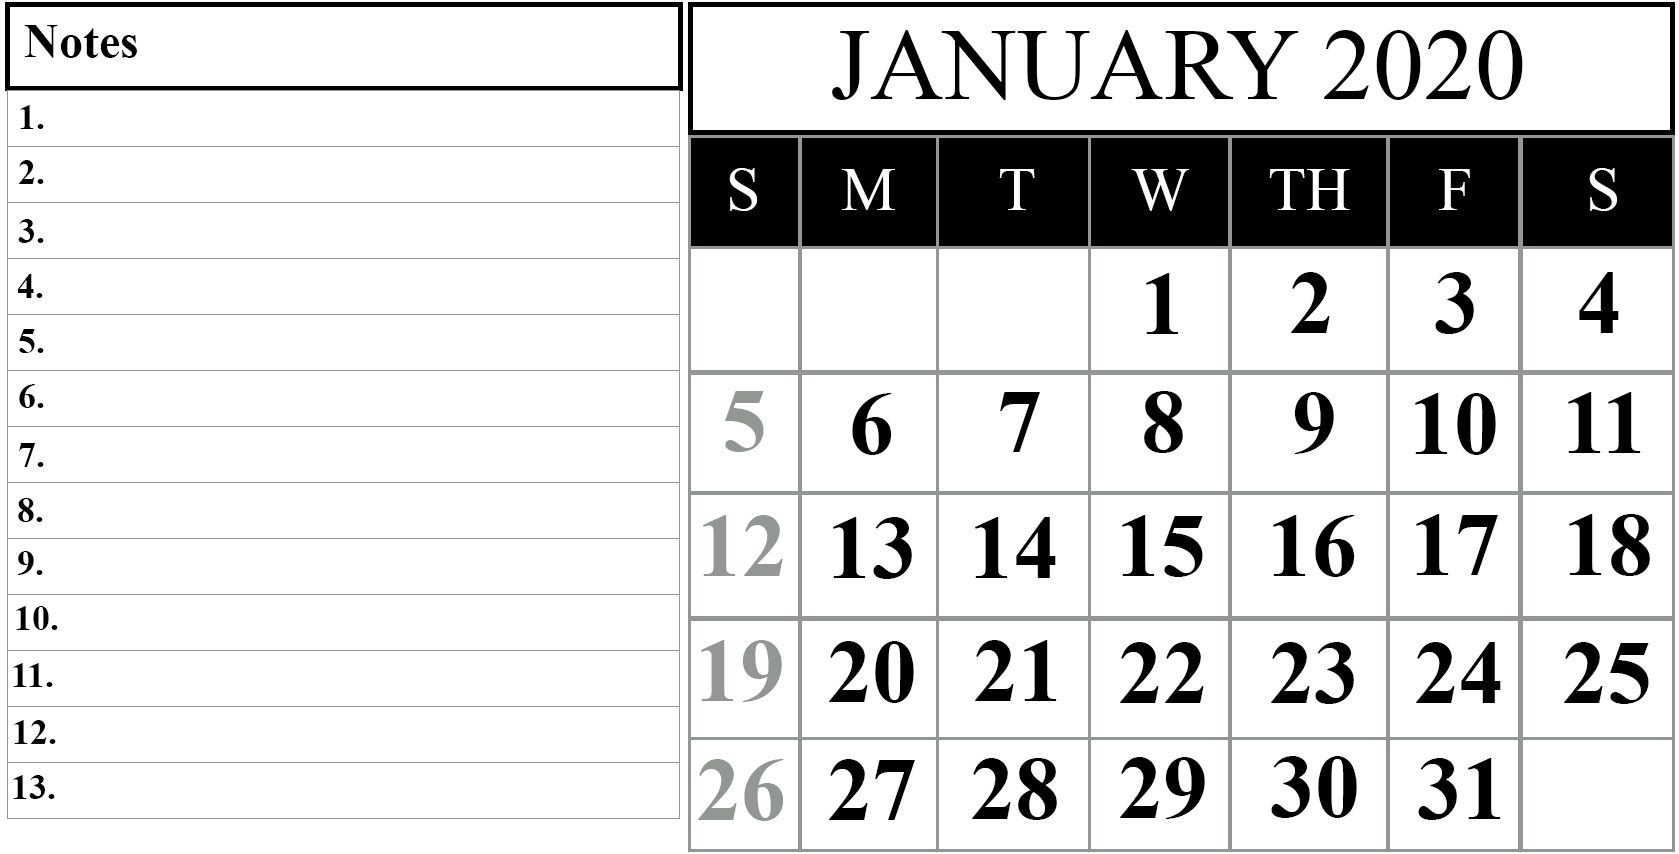 Free January 2020 Blank Calendar Template